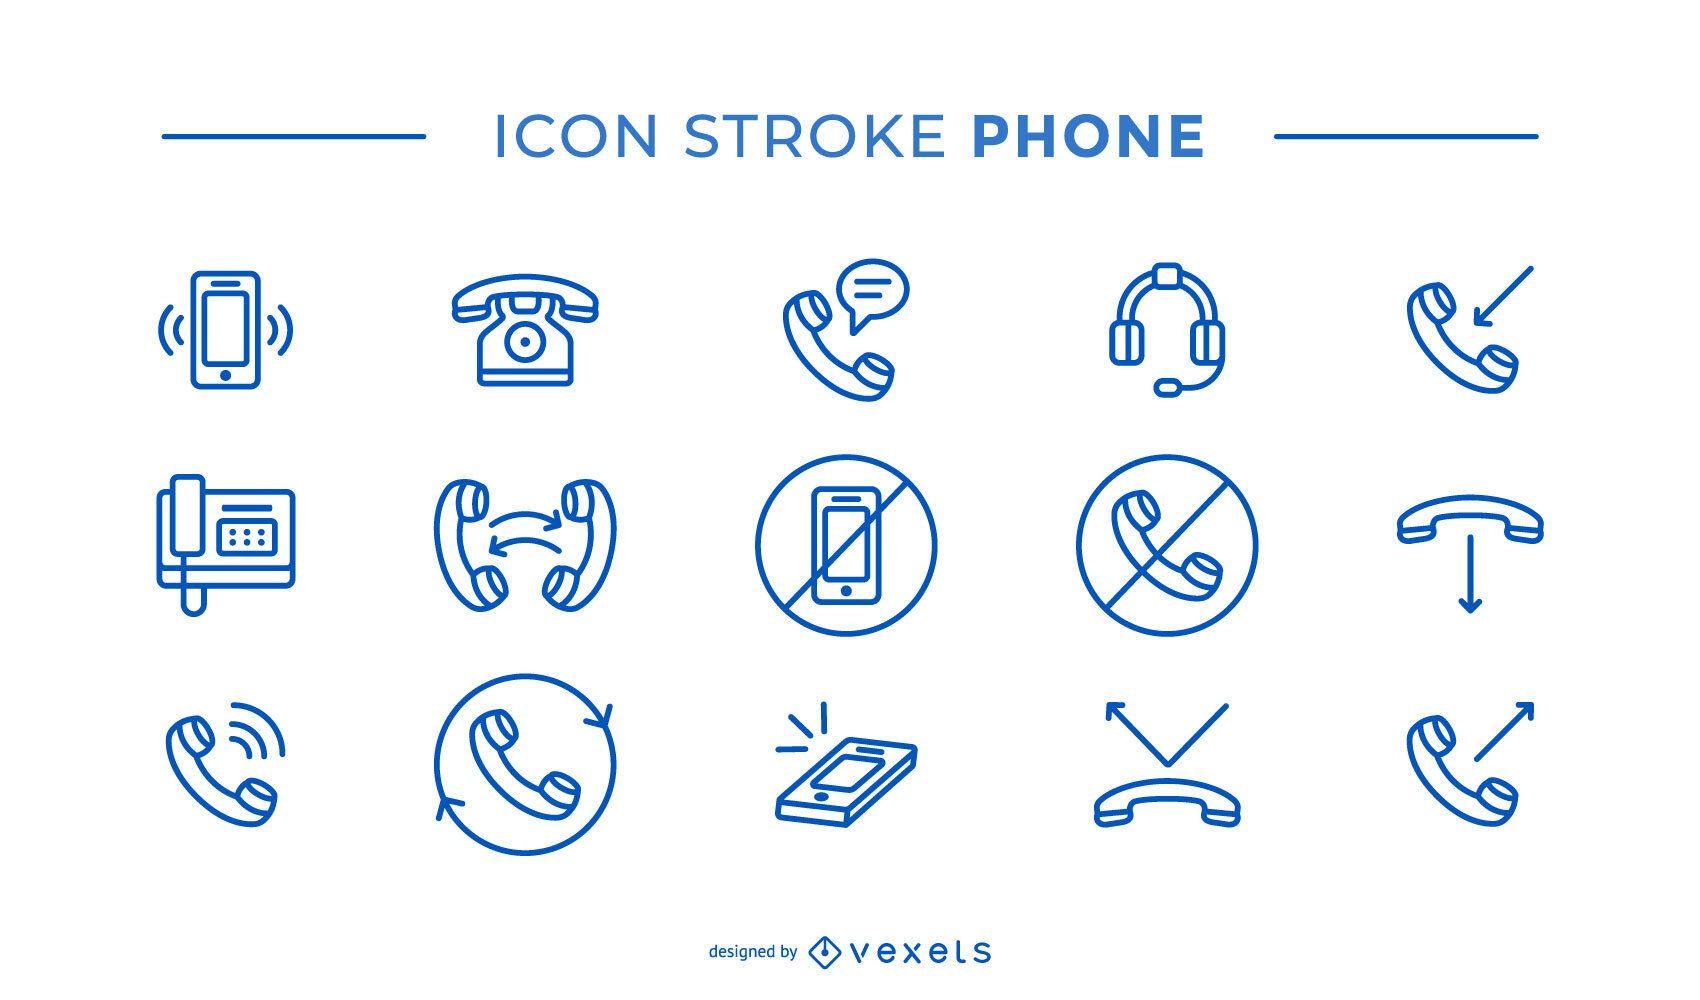 Paquete de iconos de trazo de teléfono